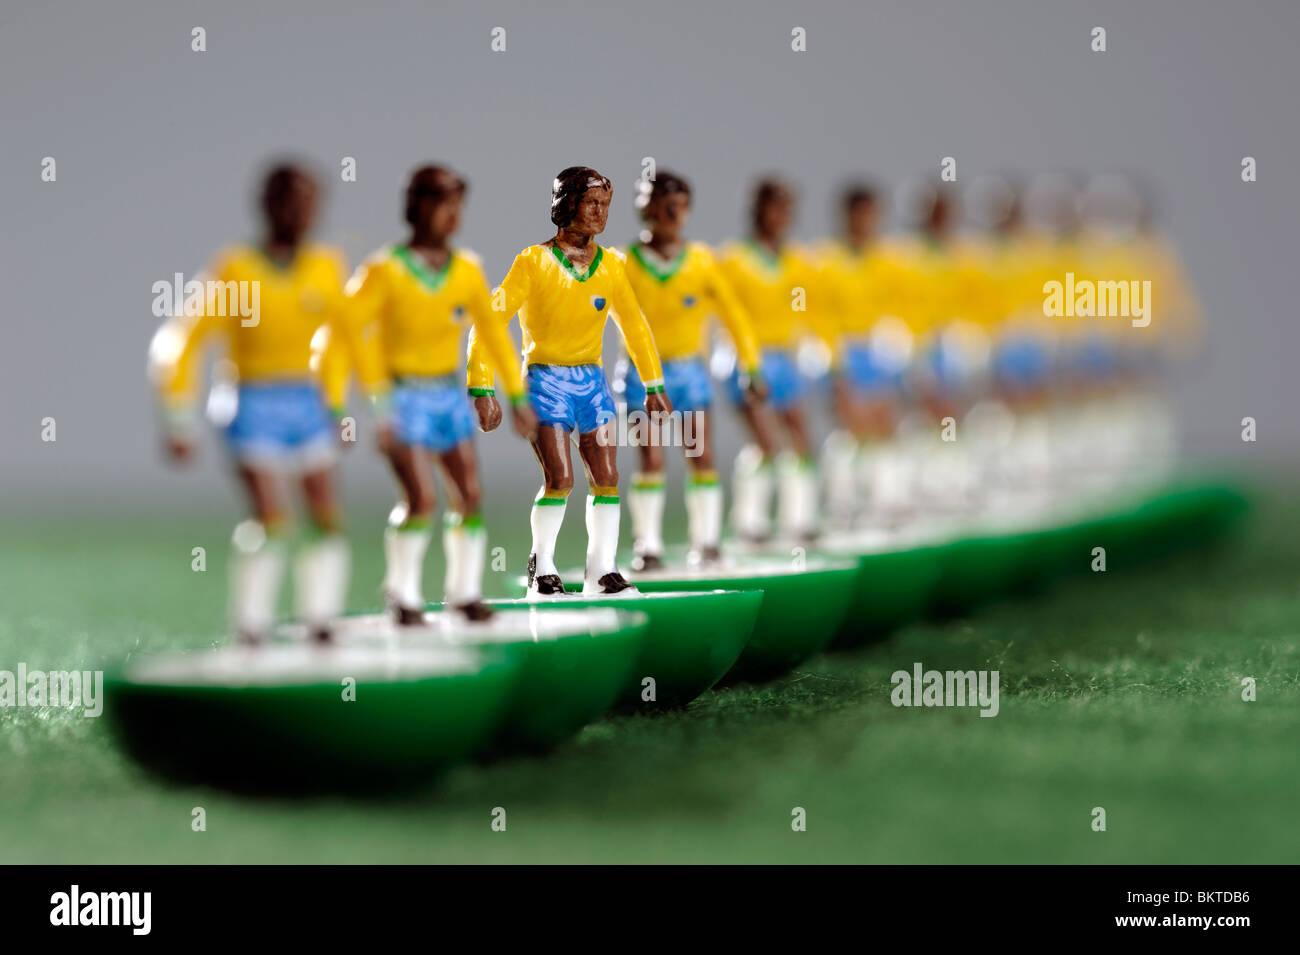 Brazil world cup subbuteo football players - Stock Image